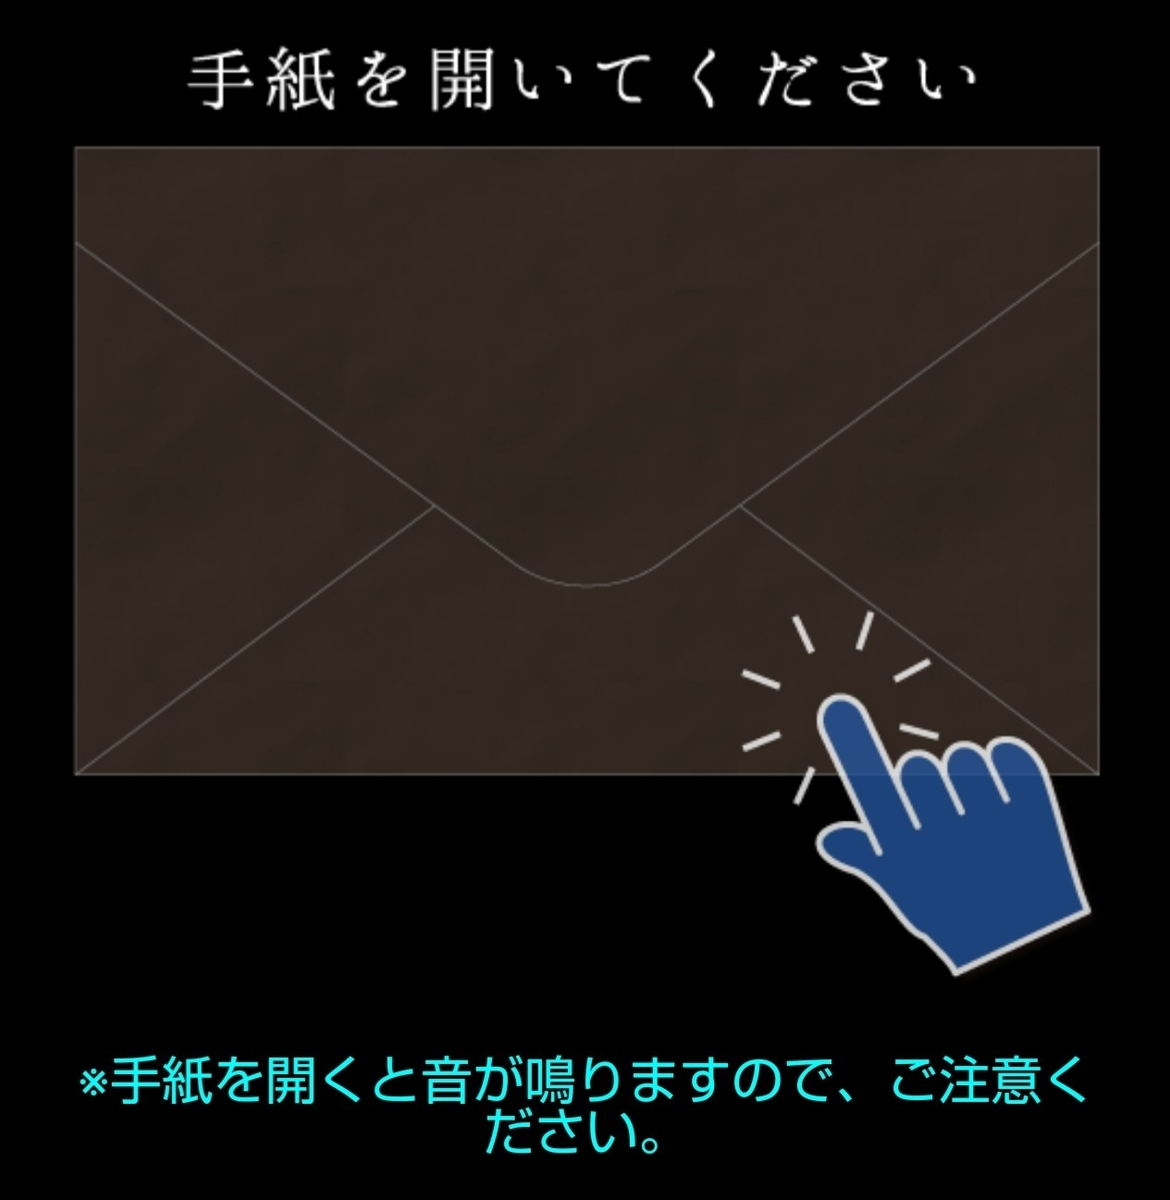 f:id:paokunshogo:20201005164457j:plain